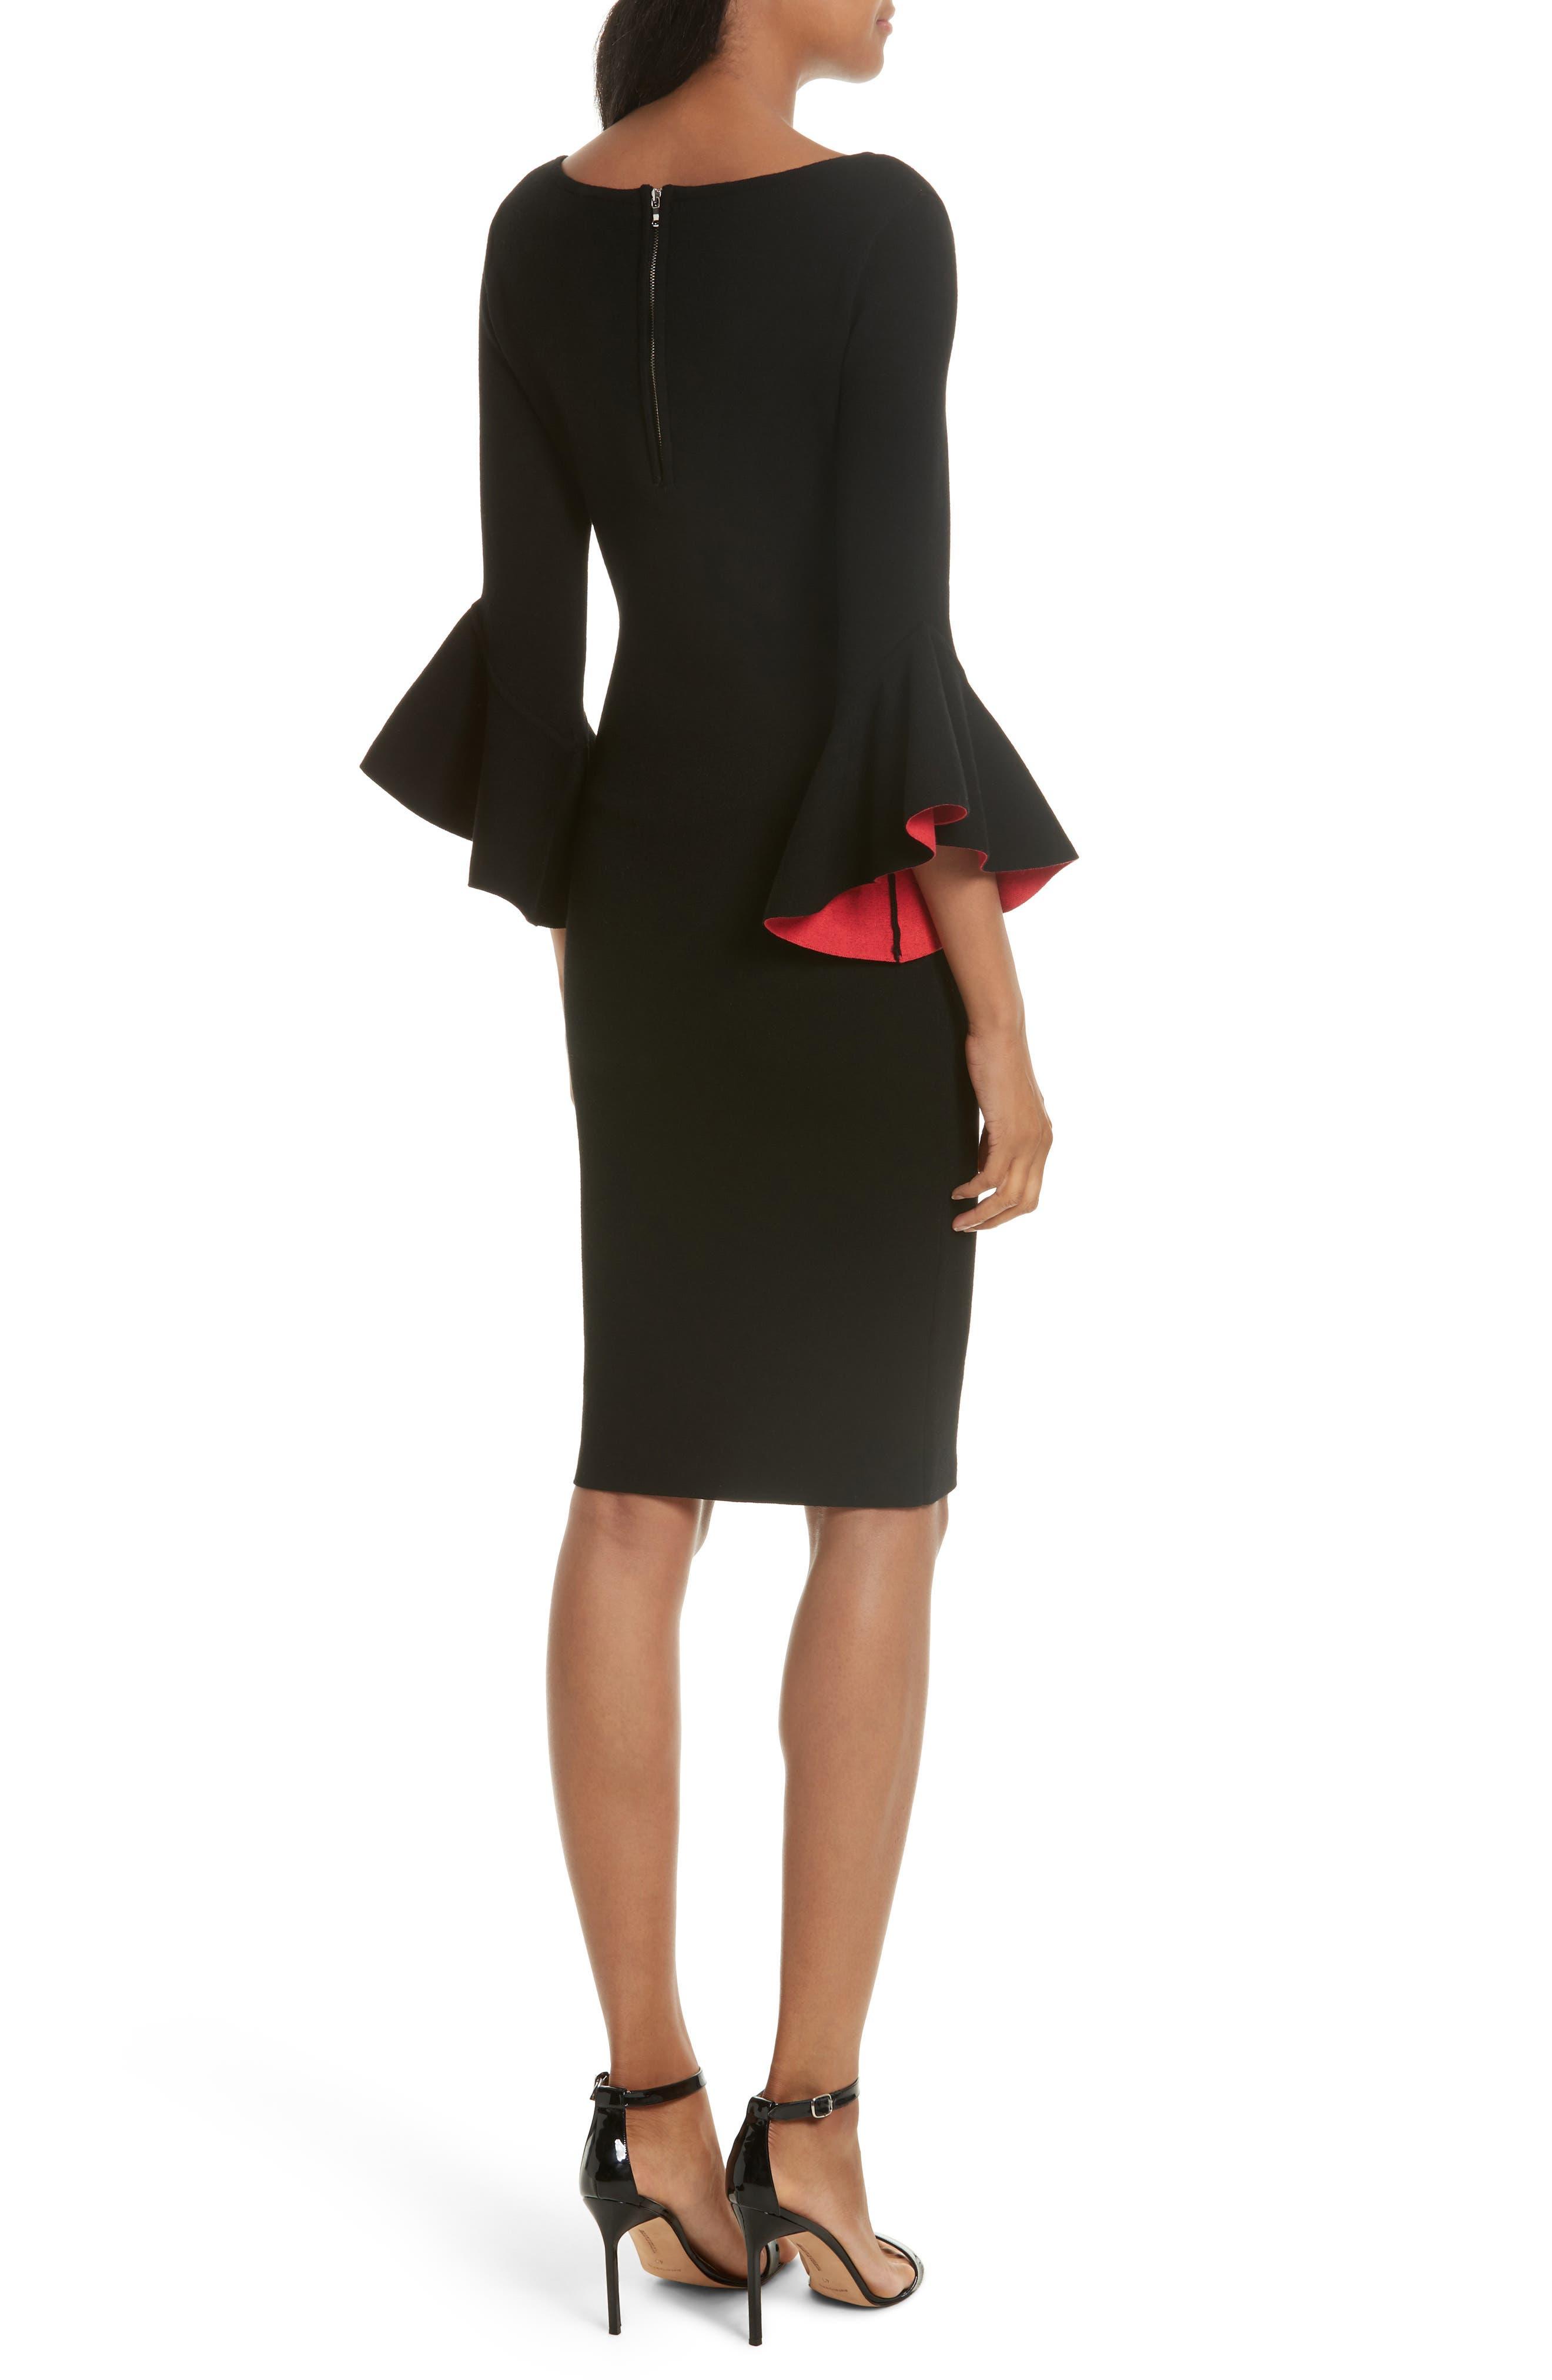 Contrast Lined Bell Sleeve Sheath Dress,                             Alternate thumbnail 2, color,                             Black/ Cherry